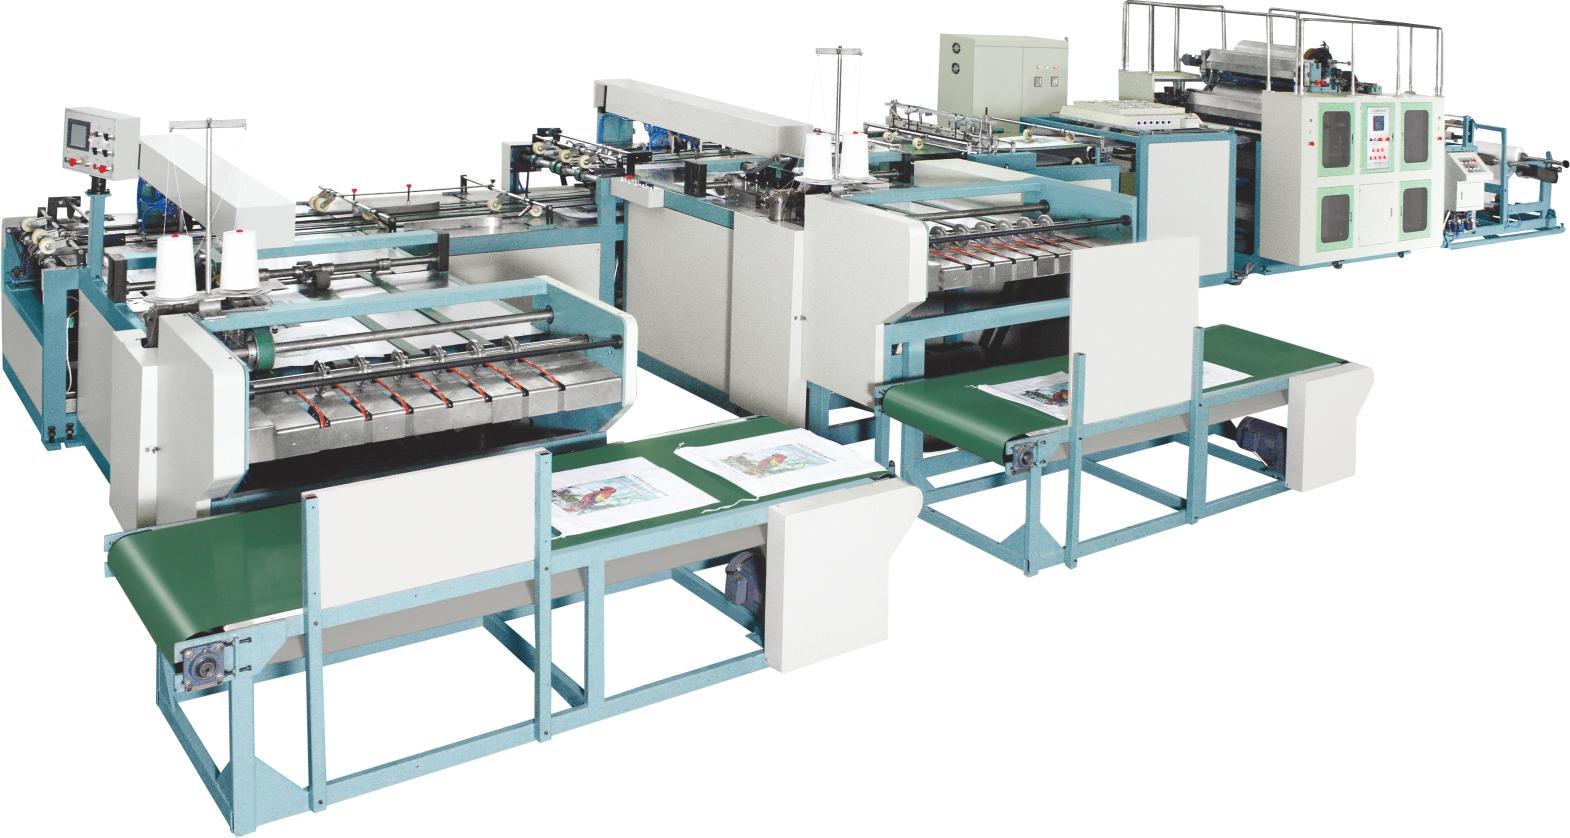 CI Type Roll-to-Roll Flexo Printing Machine